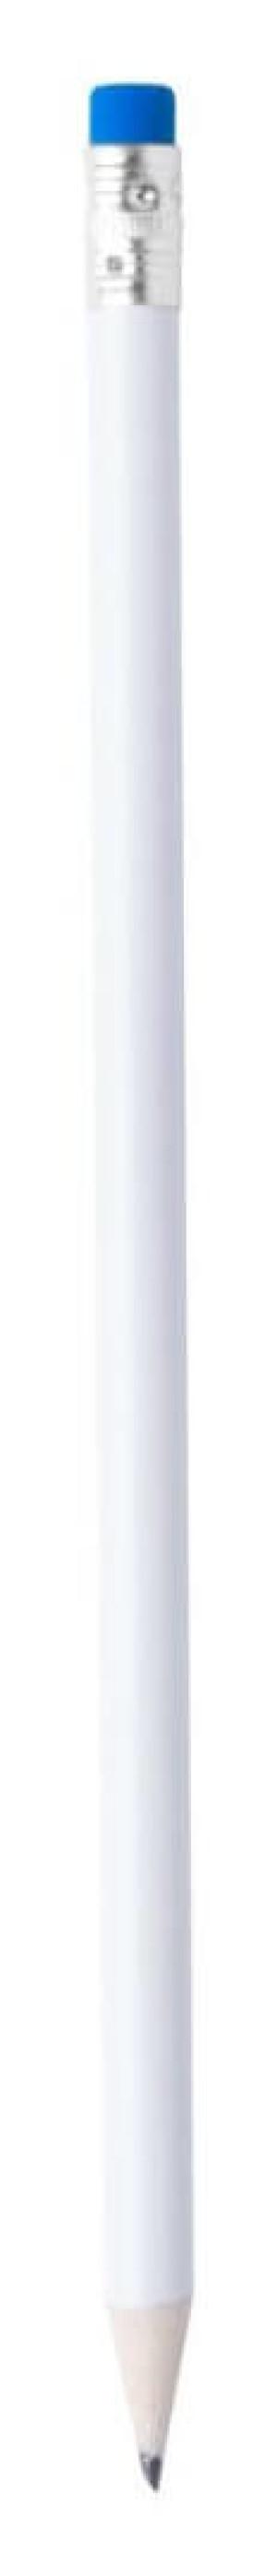 Naftar tužka